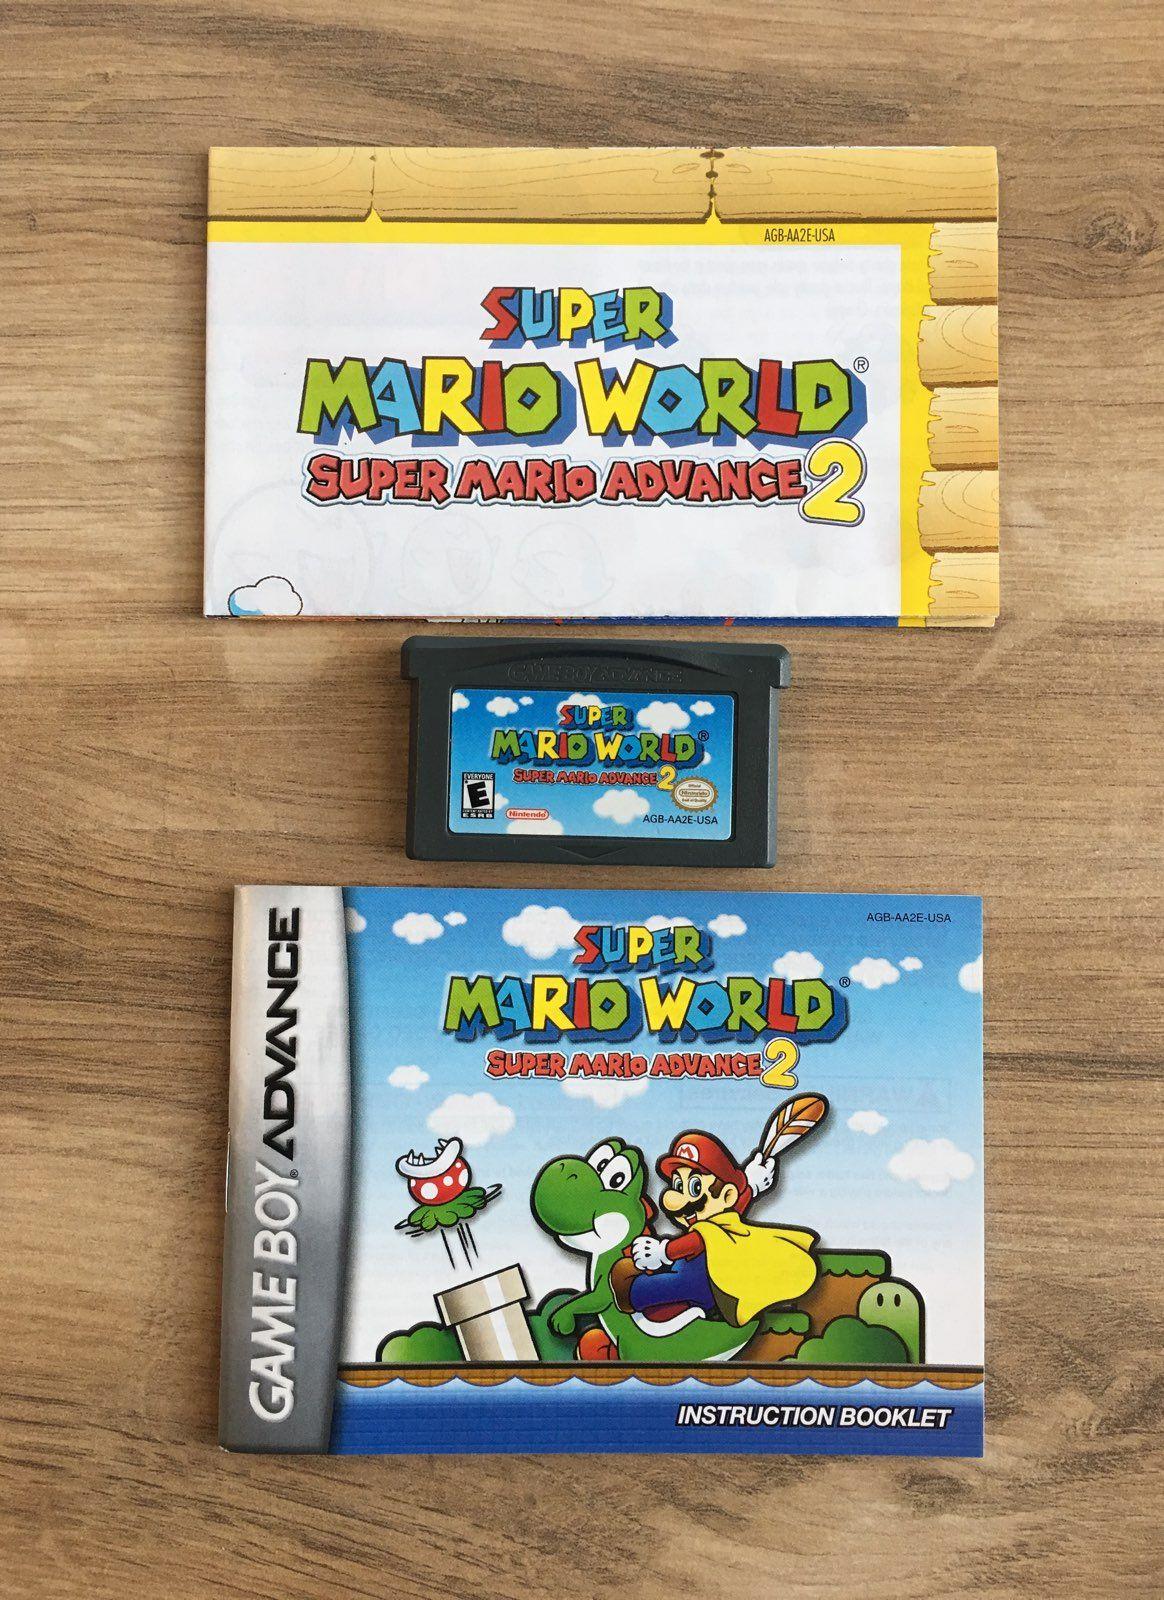 Super Mario Advance 2 Super Mario World For The Nintendo Game